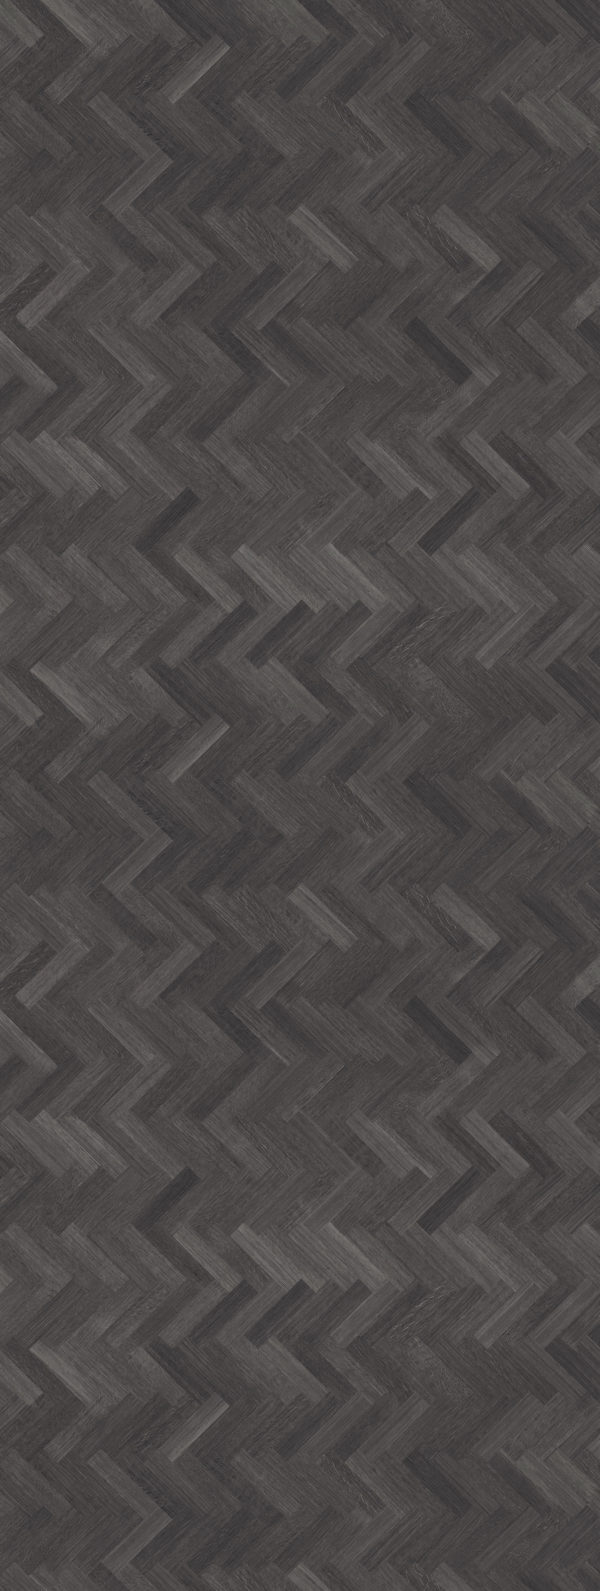 Axiom Graphite Oak Full Length Image